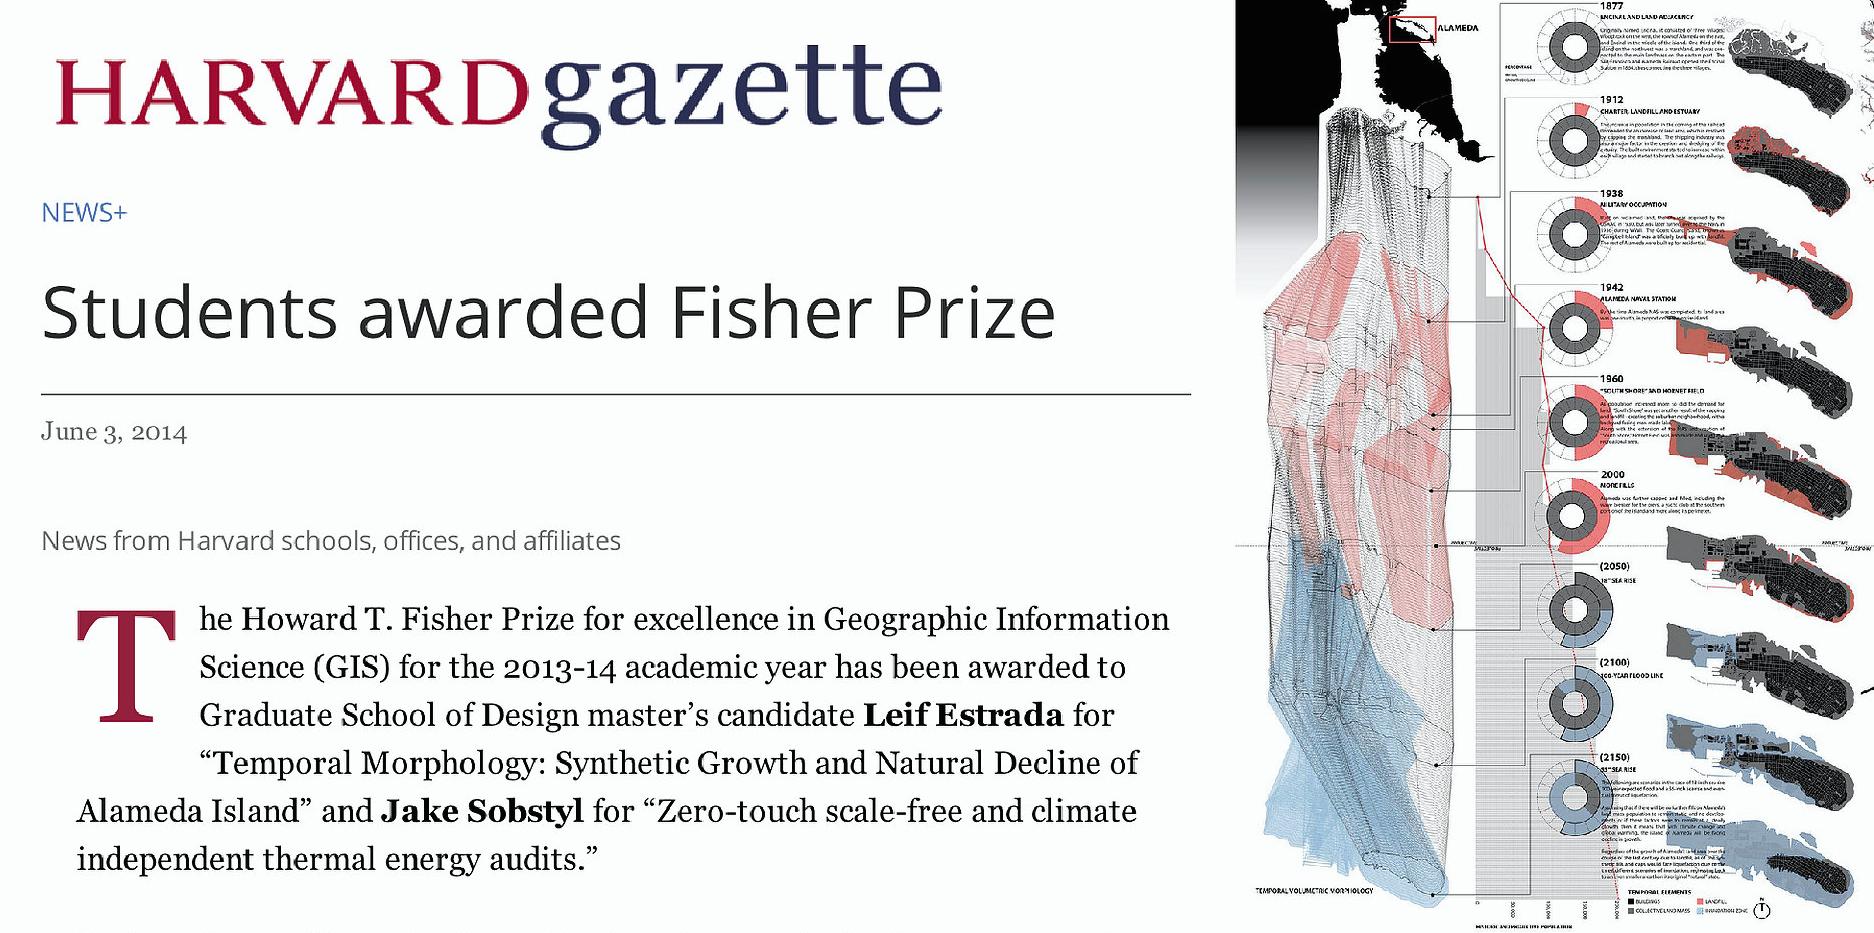 Students Awarded Fisher Prize (Harvard Gazette)